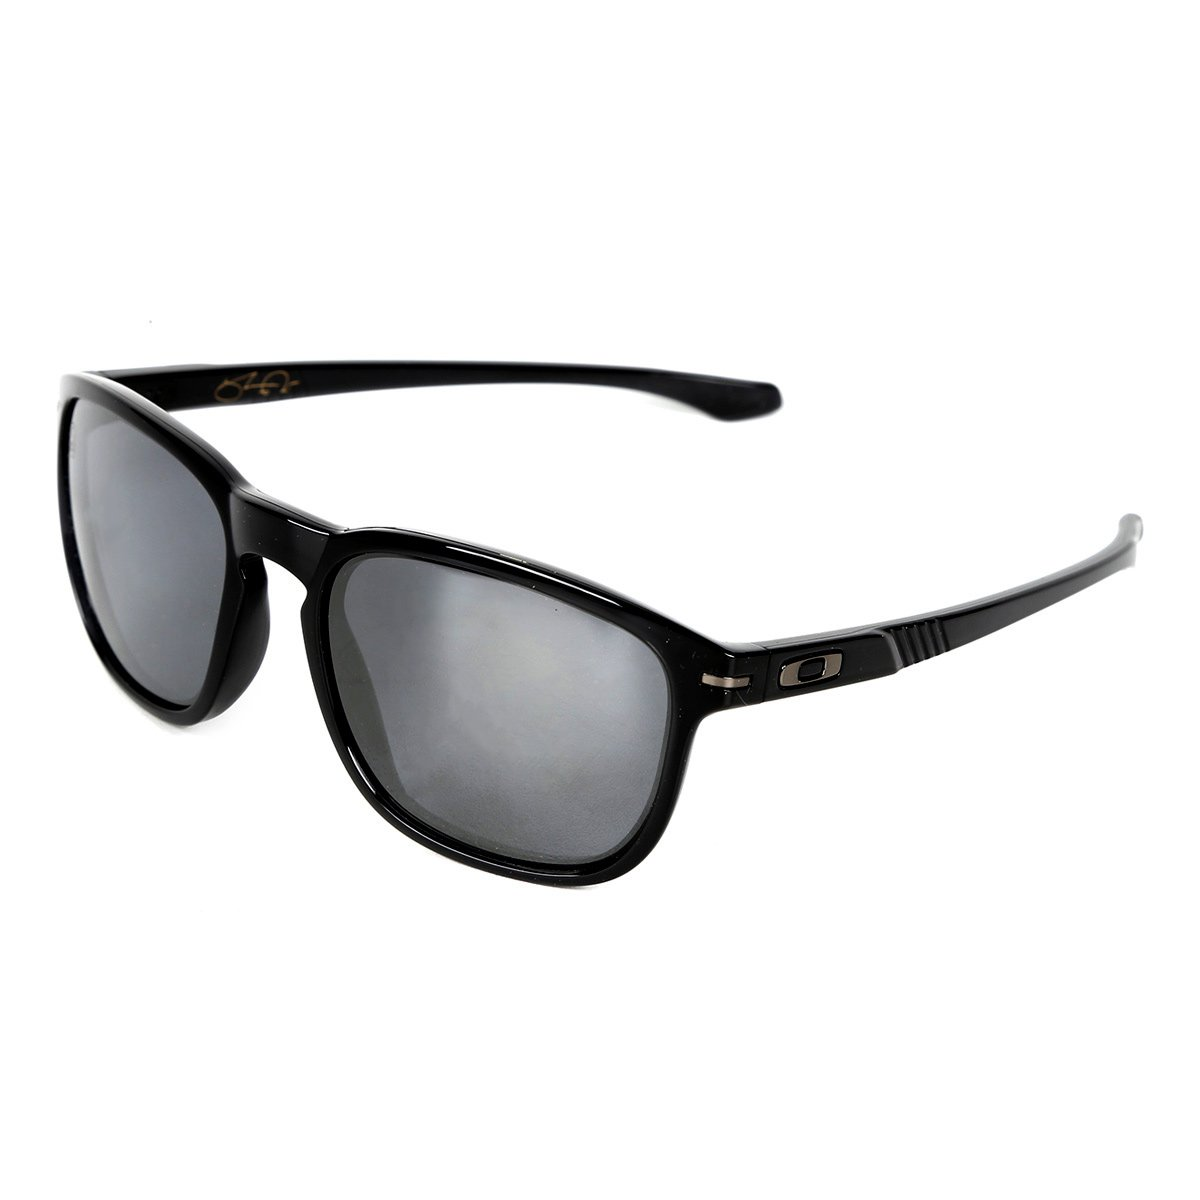 ffe301116f63d Óculos Oakley Enduro Masculino - Compre Agora